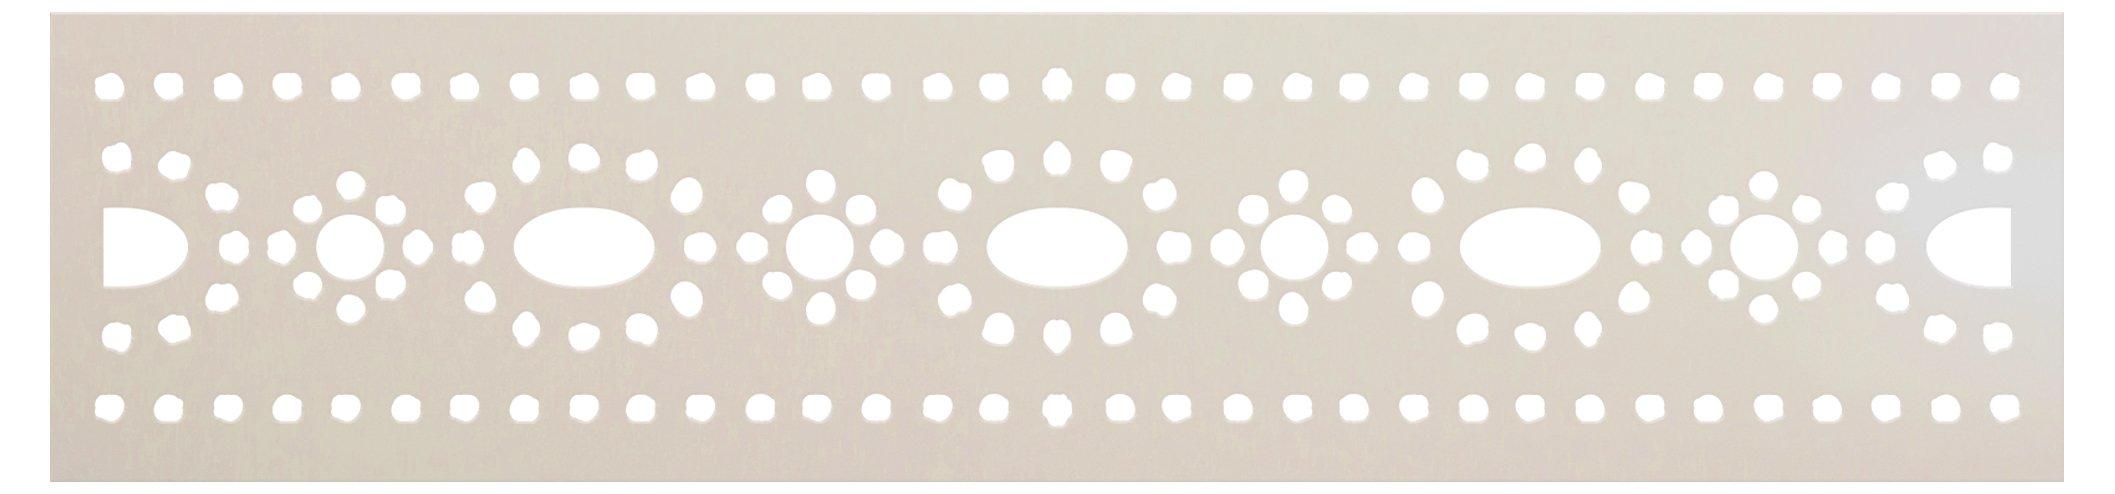 Hindu Dot Flower & Oval Banding Stencil by StudioR12 | Craft DIY Backsplash Indian Pattern Home Decor | Paint Wood Sign Border | Select Size